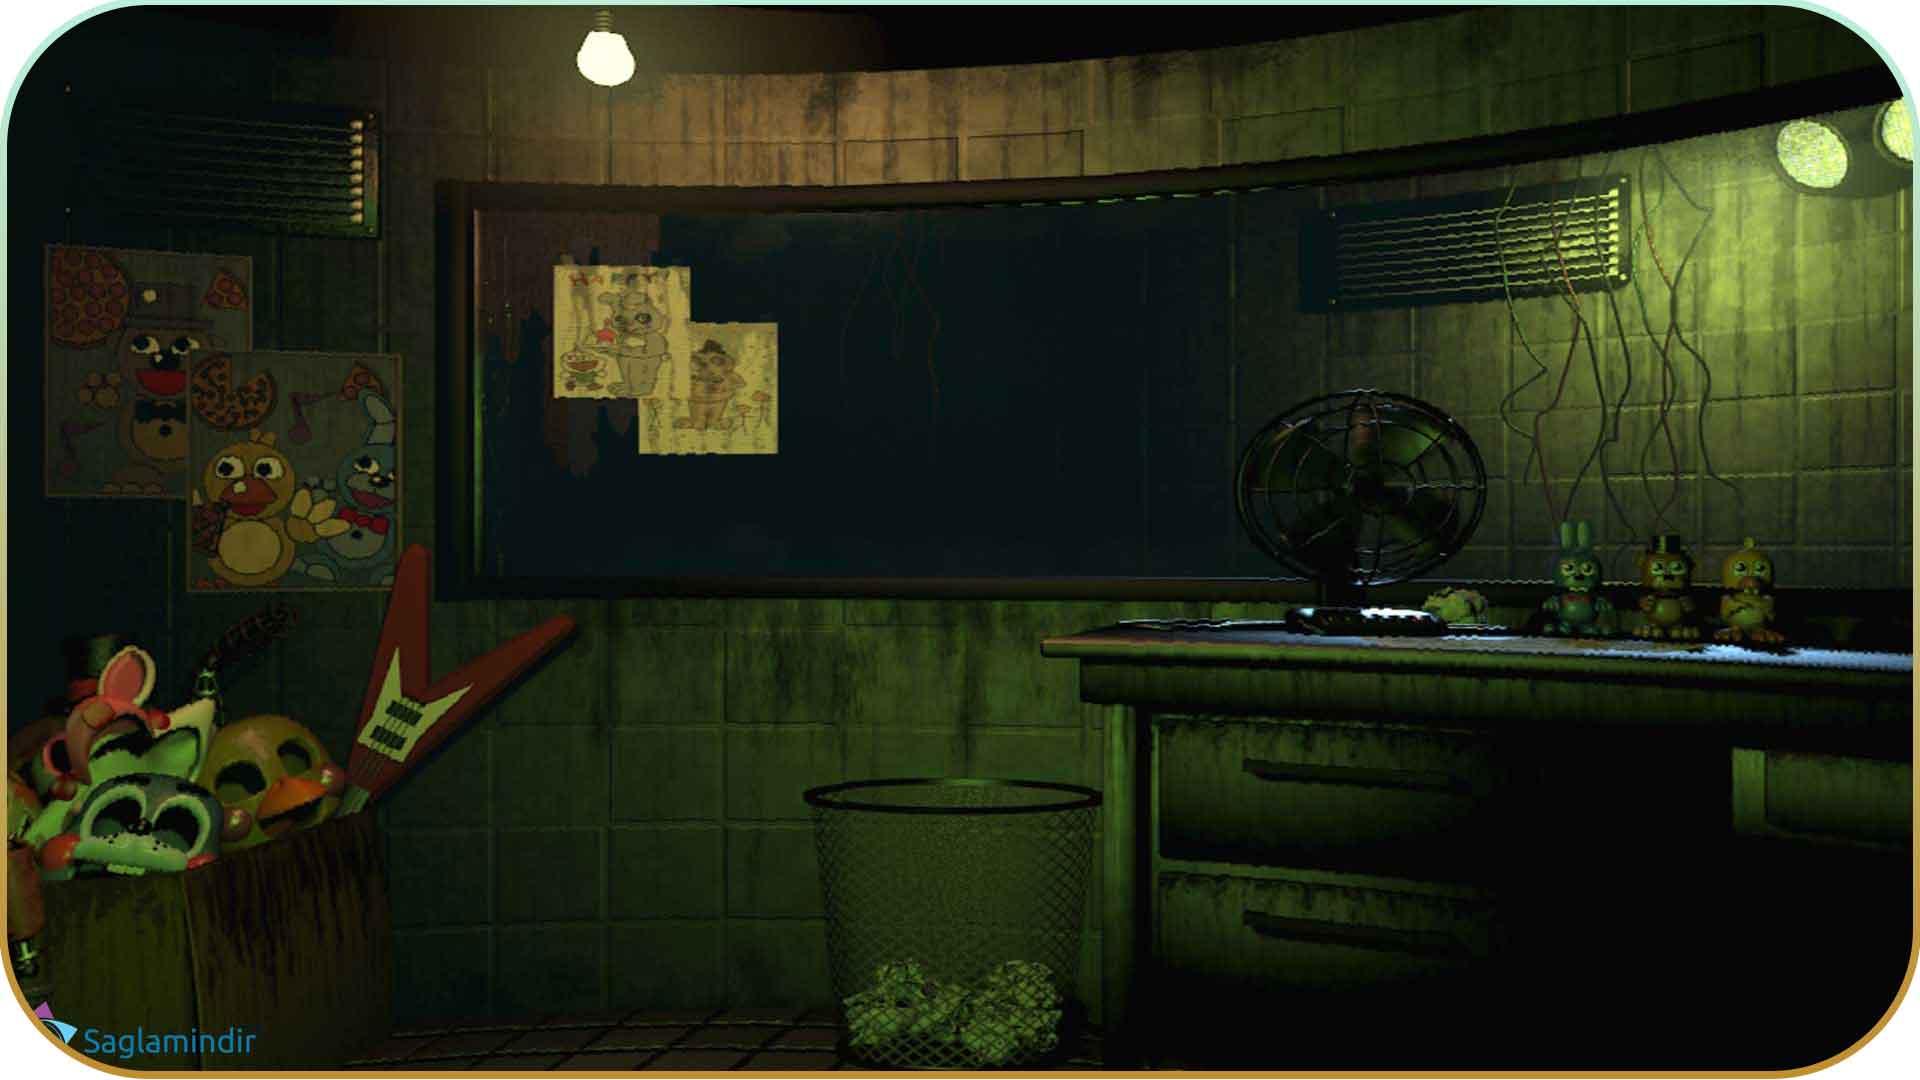 Five Nights at Freddy's 3 saglamindir